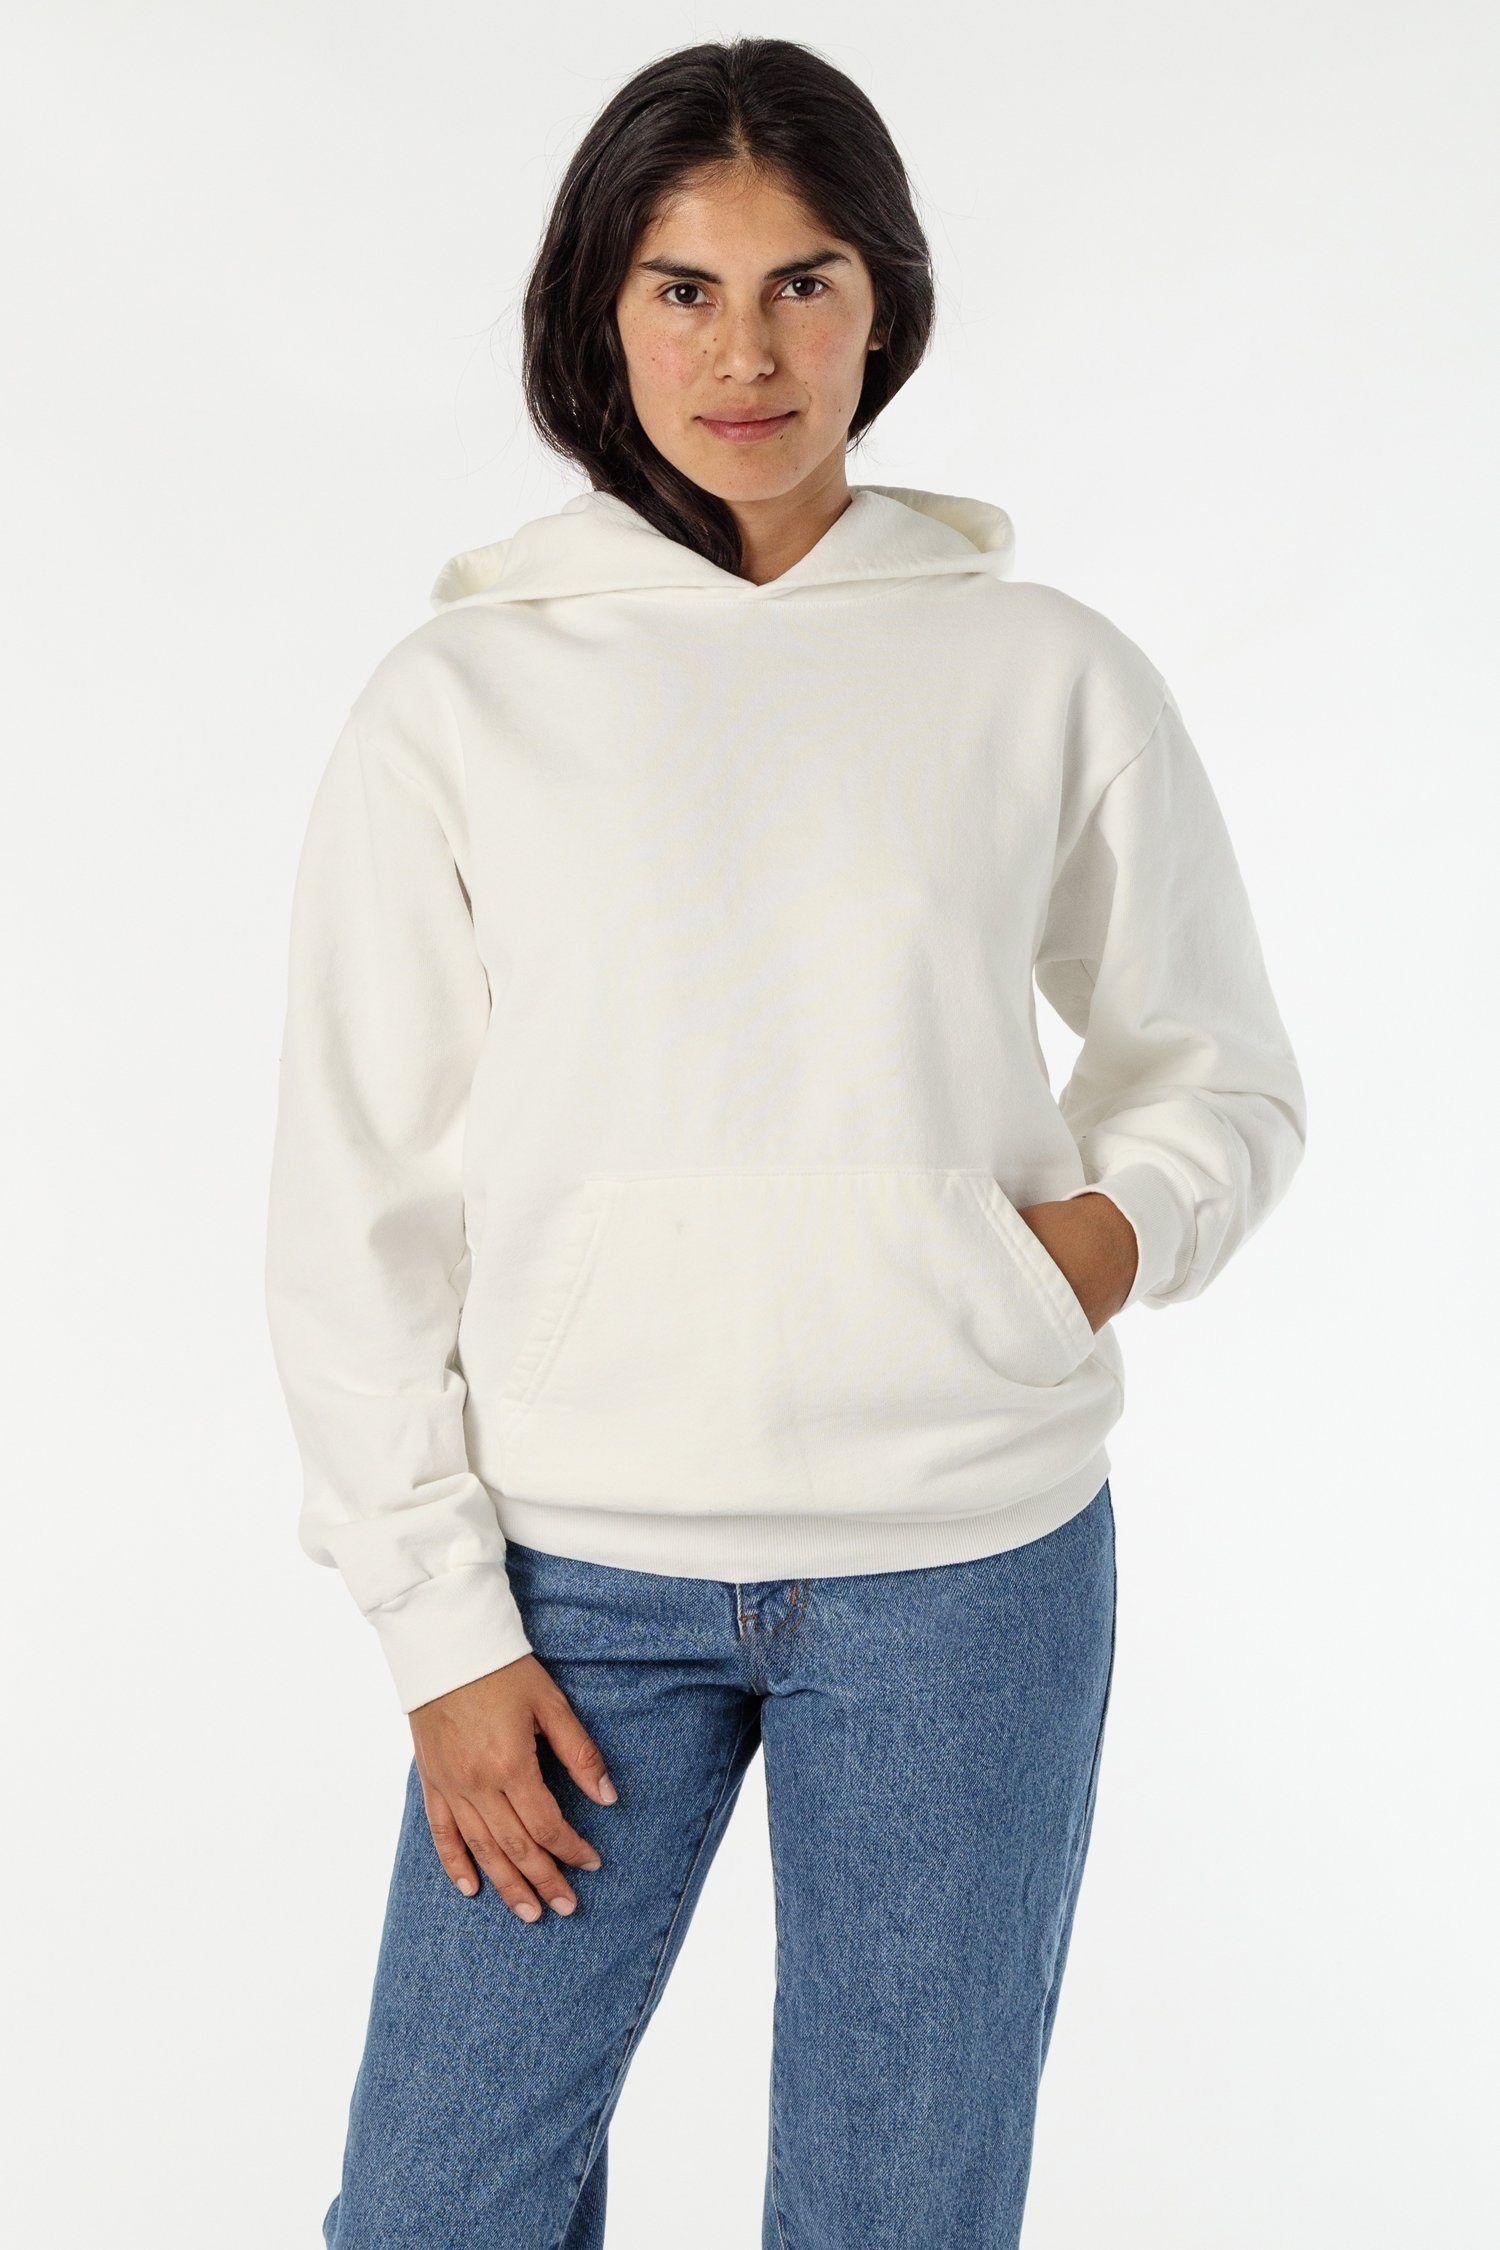 Hf09gd Unisex Garment Dye 14oz Heavy Fleece Hooded Pullover Sweatshirt Hooded Pullover Sweatshirts Pullover Sweatshirt